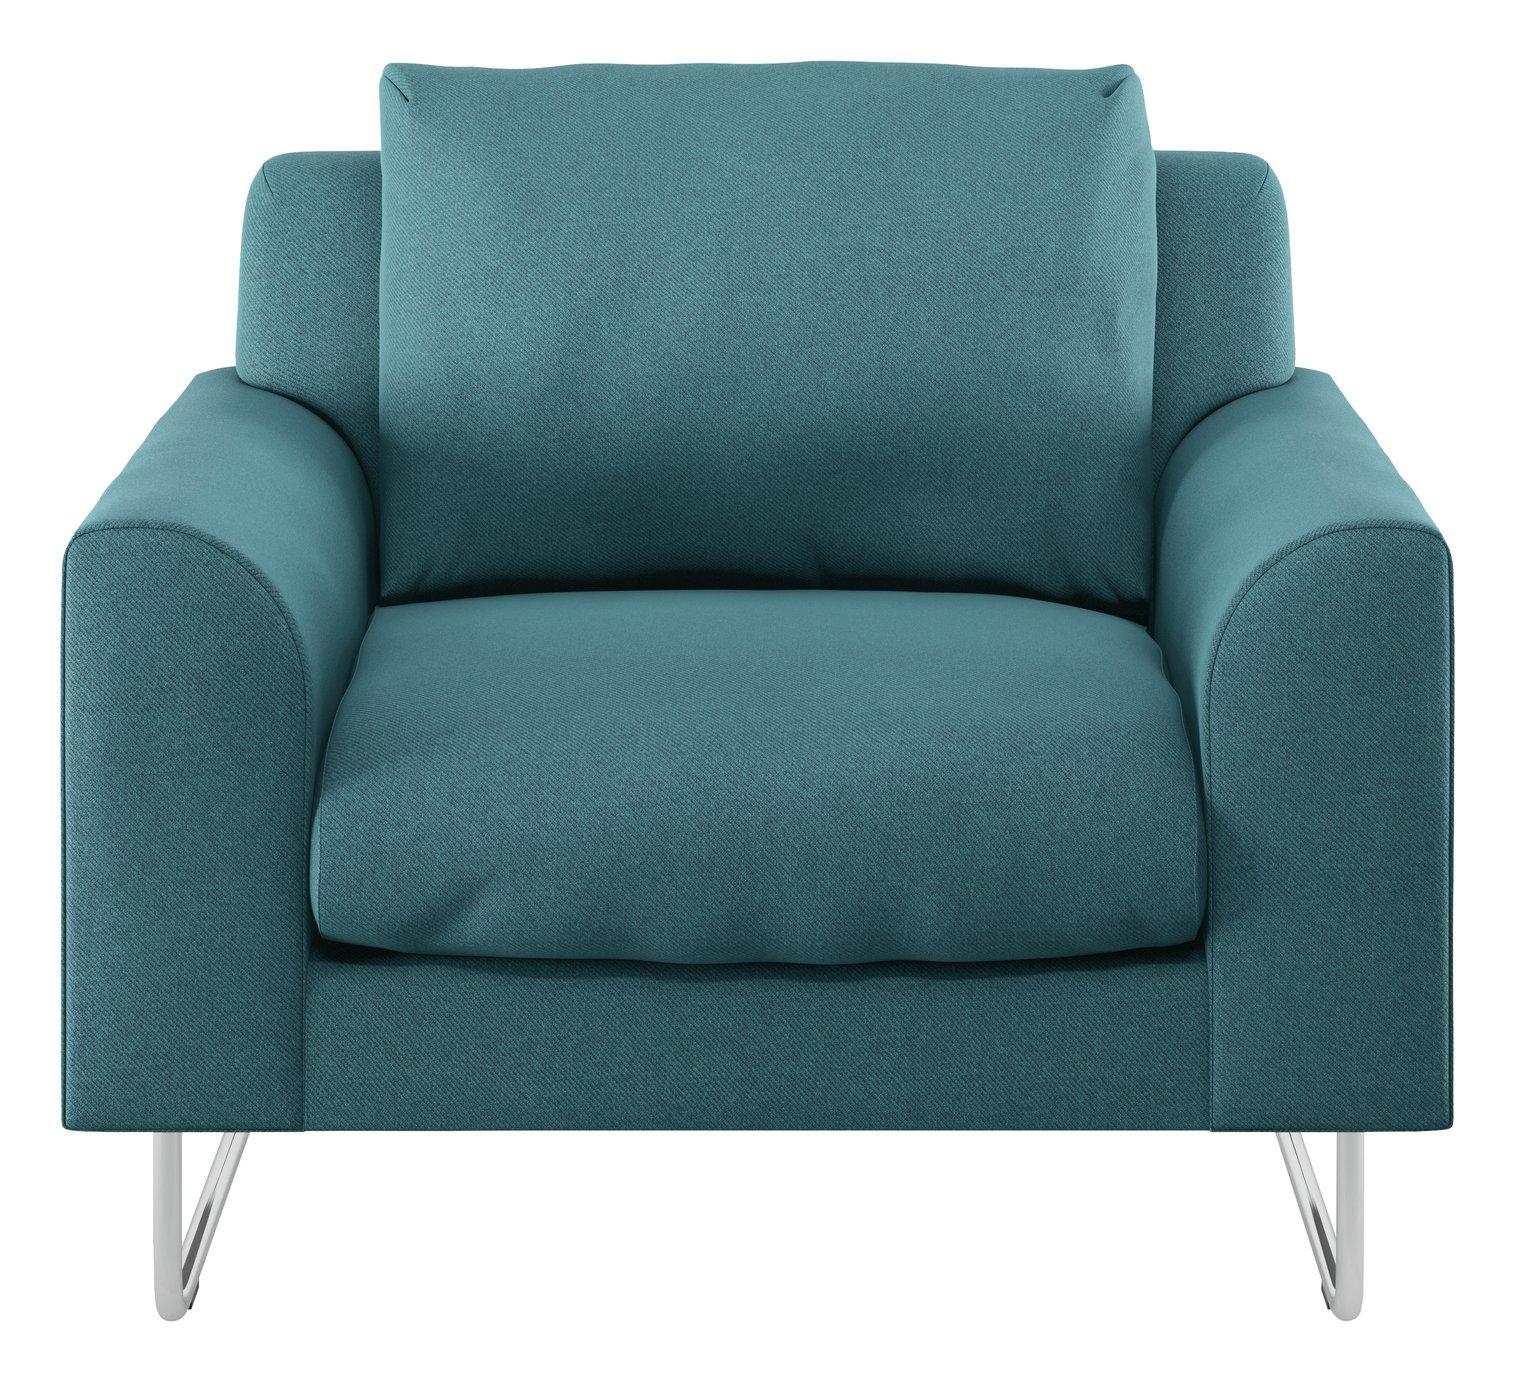 Habitat Lyle Teal Fabric Armchair